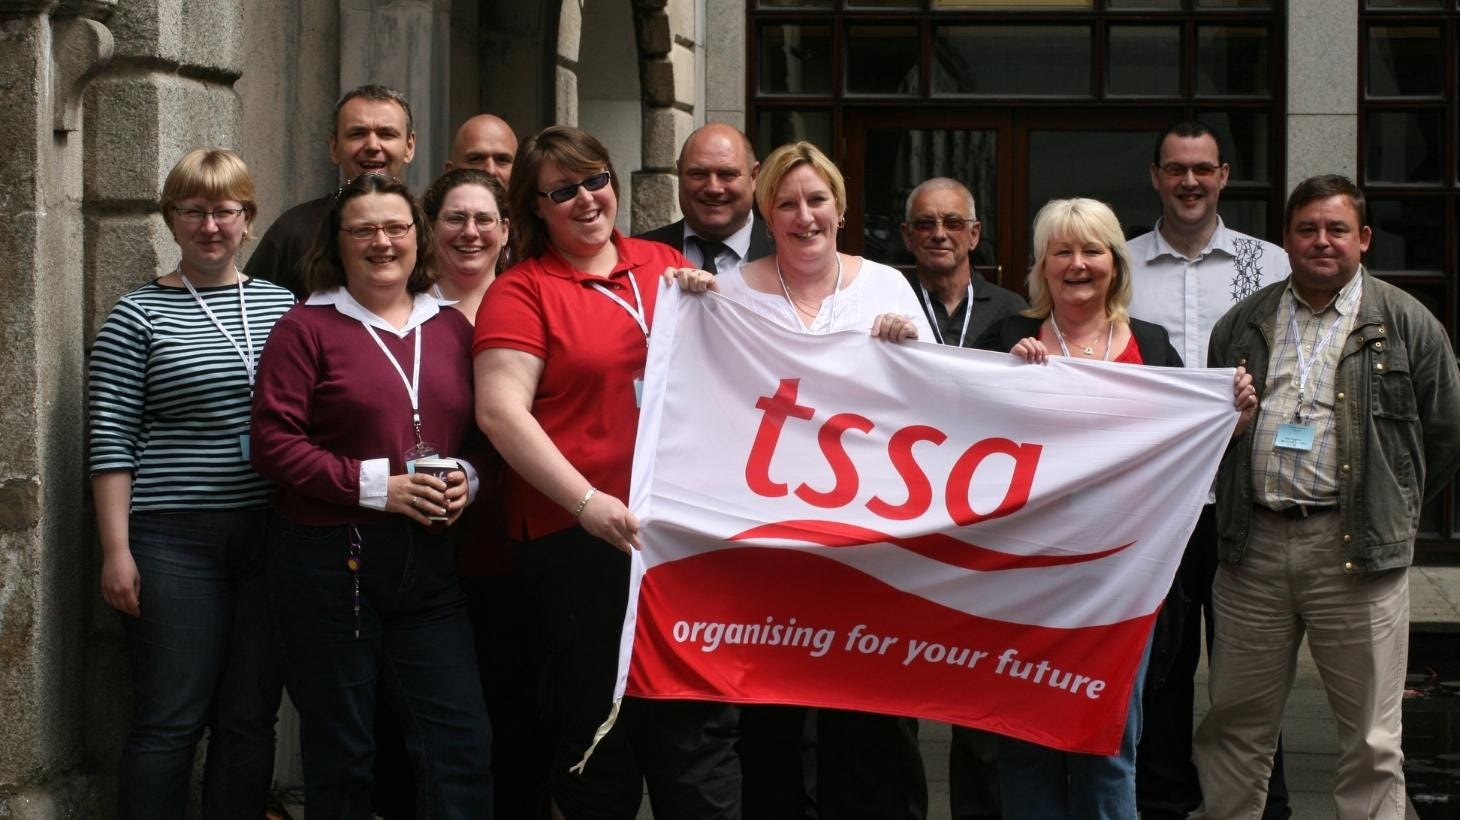 TSSA reps holding a TSSA logo flag